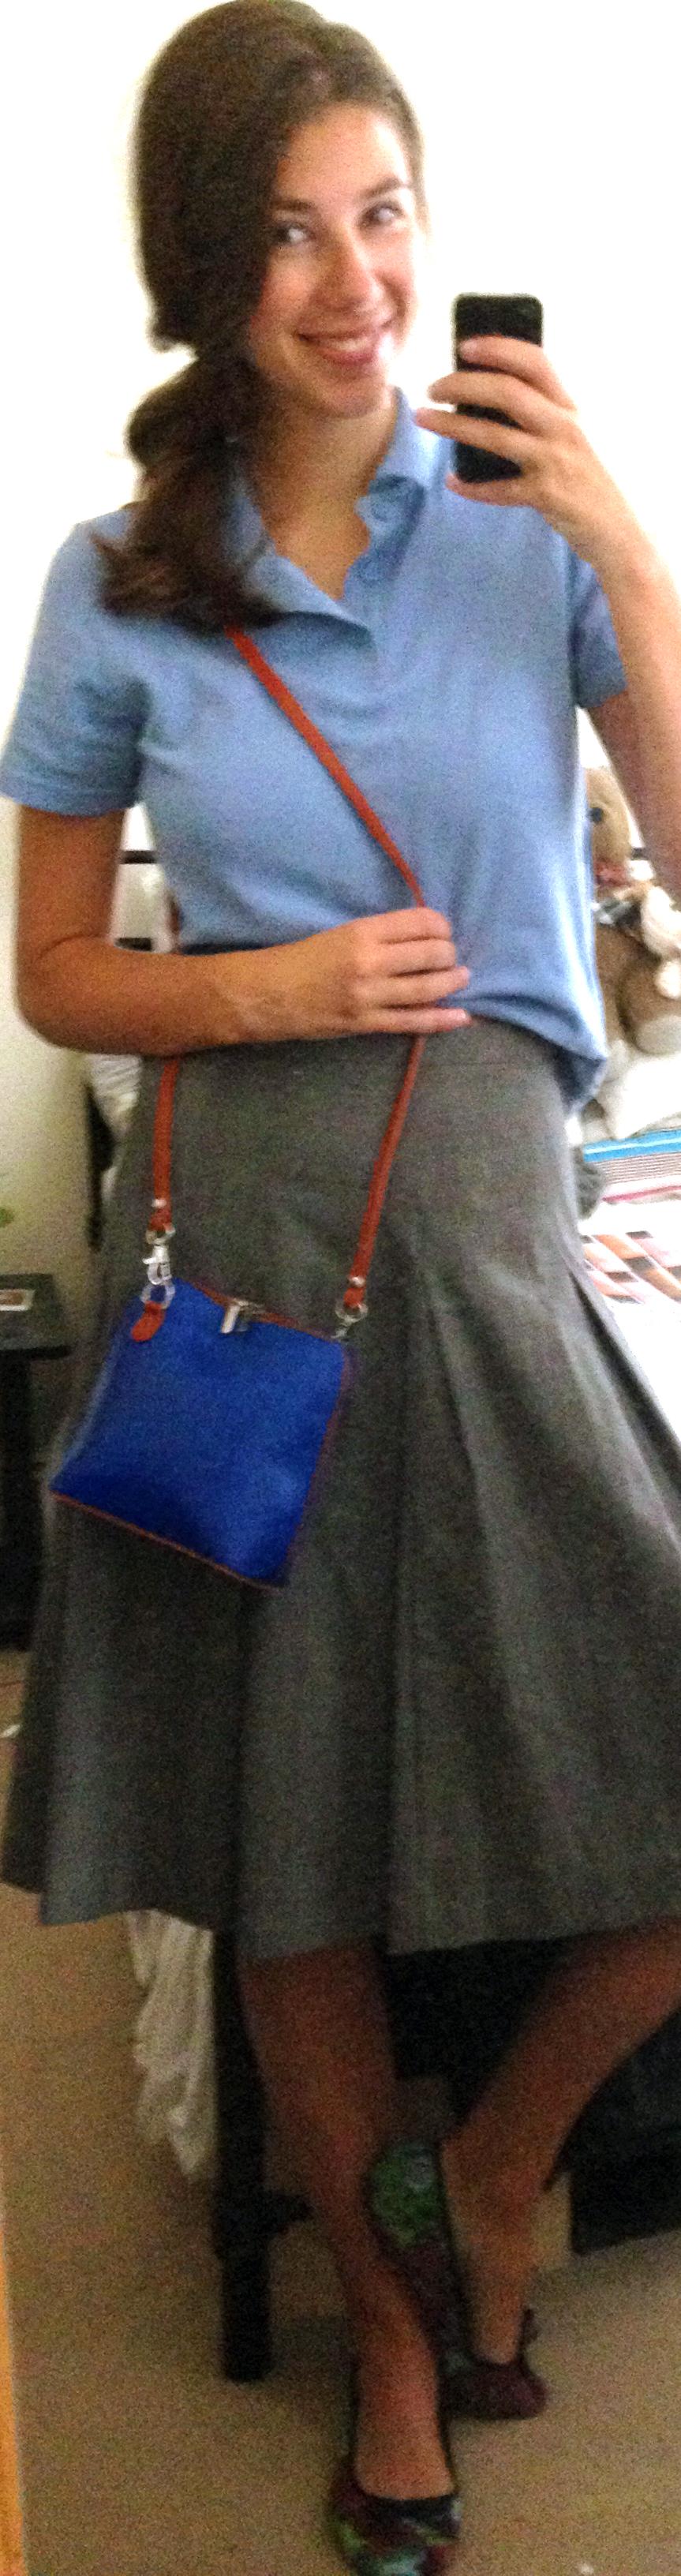 Target x Isaac Mizrahi Grey Plaid Skirt,  Boy's Polo Shirt ,  Cobalt Blue Crossbody Bag ,  Floral Flats